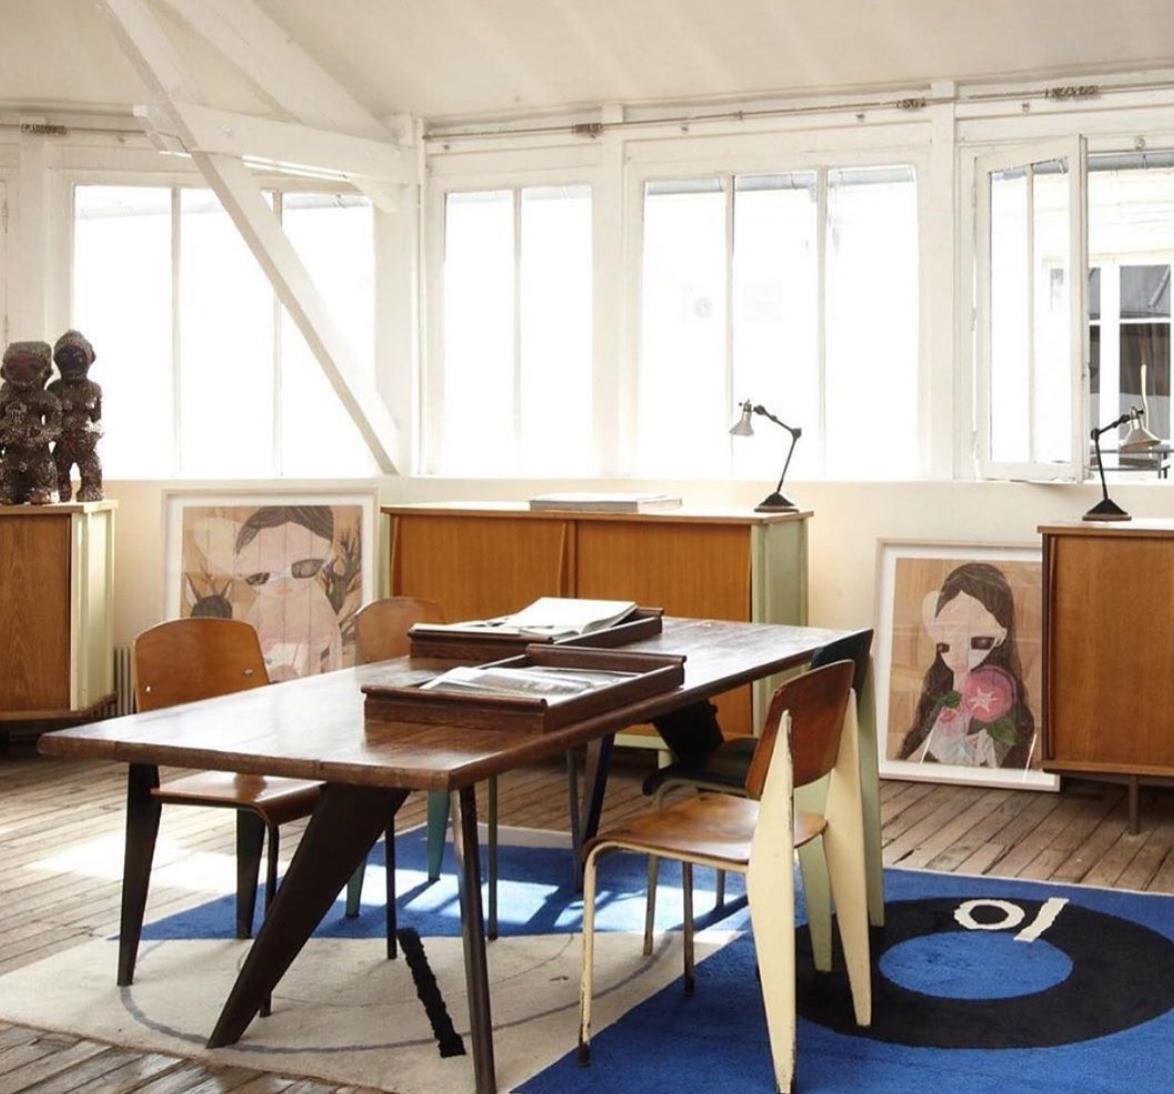 #interiors #interiordesign #design #prouve #perriand #lecorbusier #modernism #midcenturyfurniture #midcenturymodern #frenchmodernism #midcenturystyle #eileengray #architecture #homedecor #decor #lifestyle #instadaily #inspiration #photo @a_gaut via @bradleyseymour